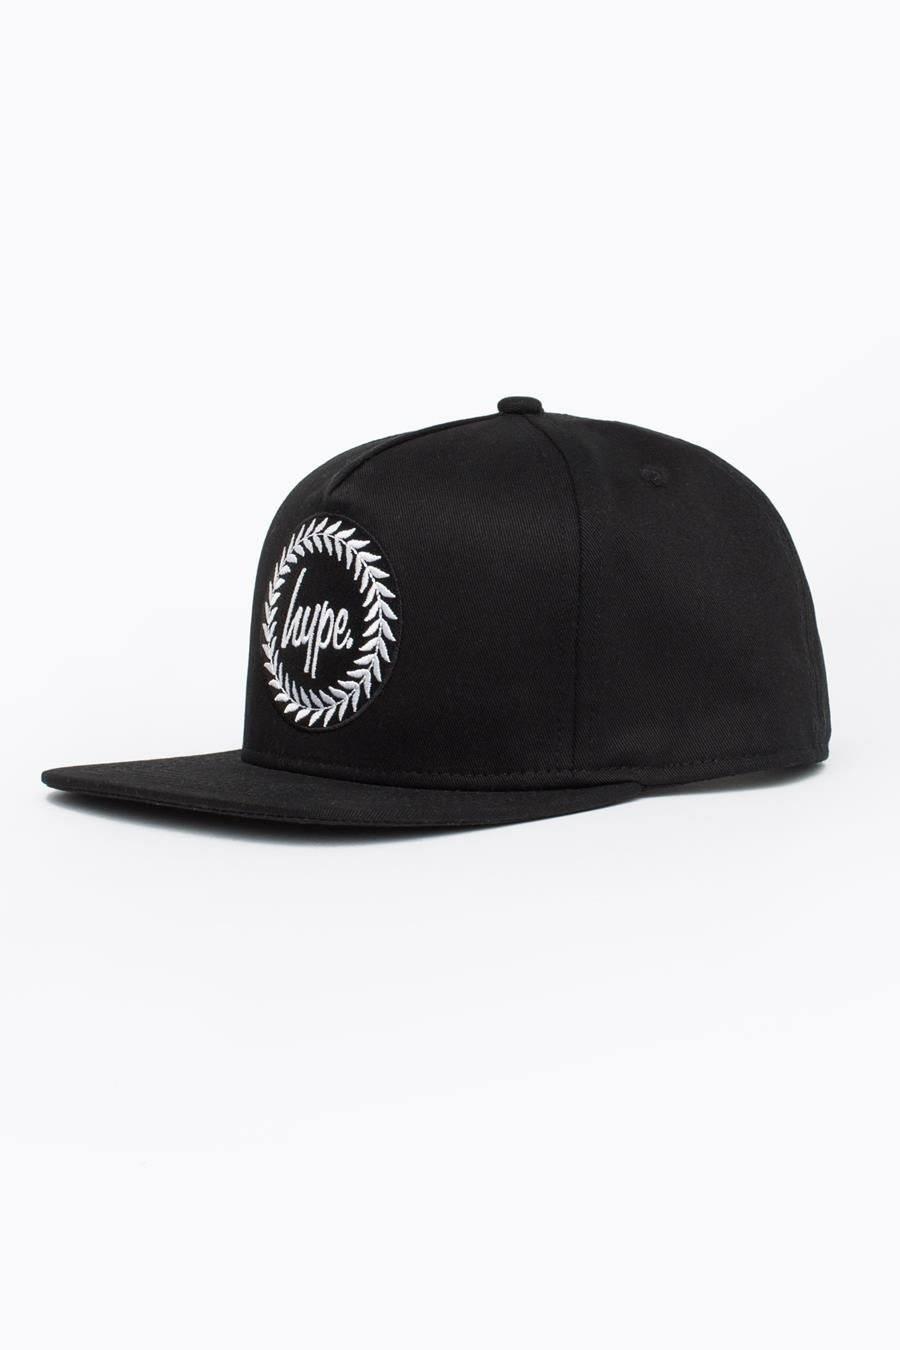 HYPE Black Crest Snapback Hat